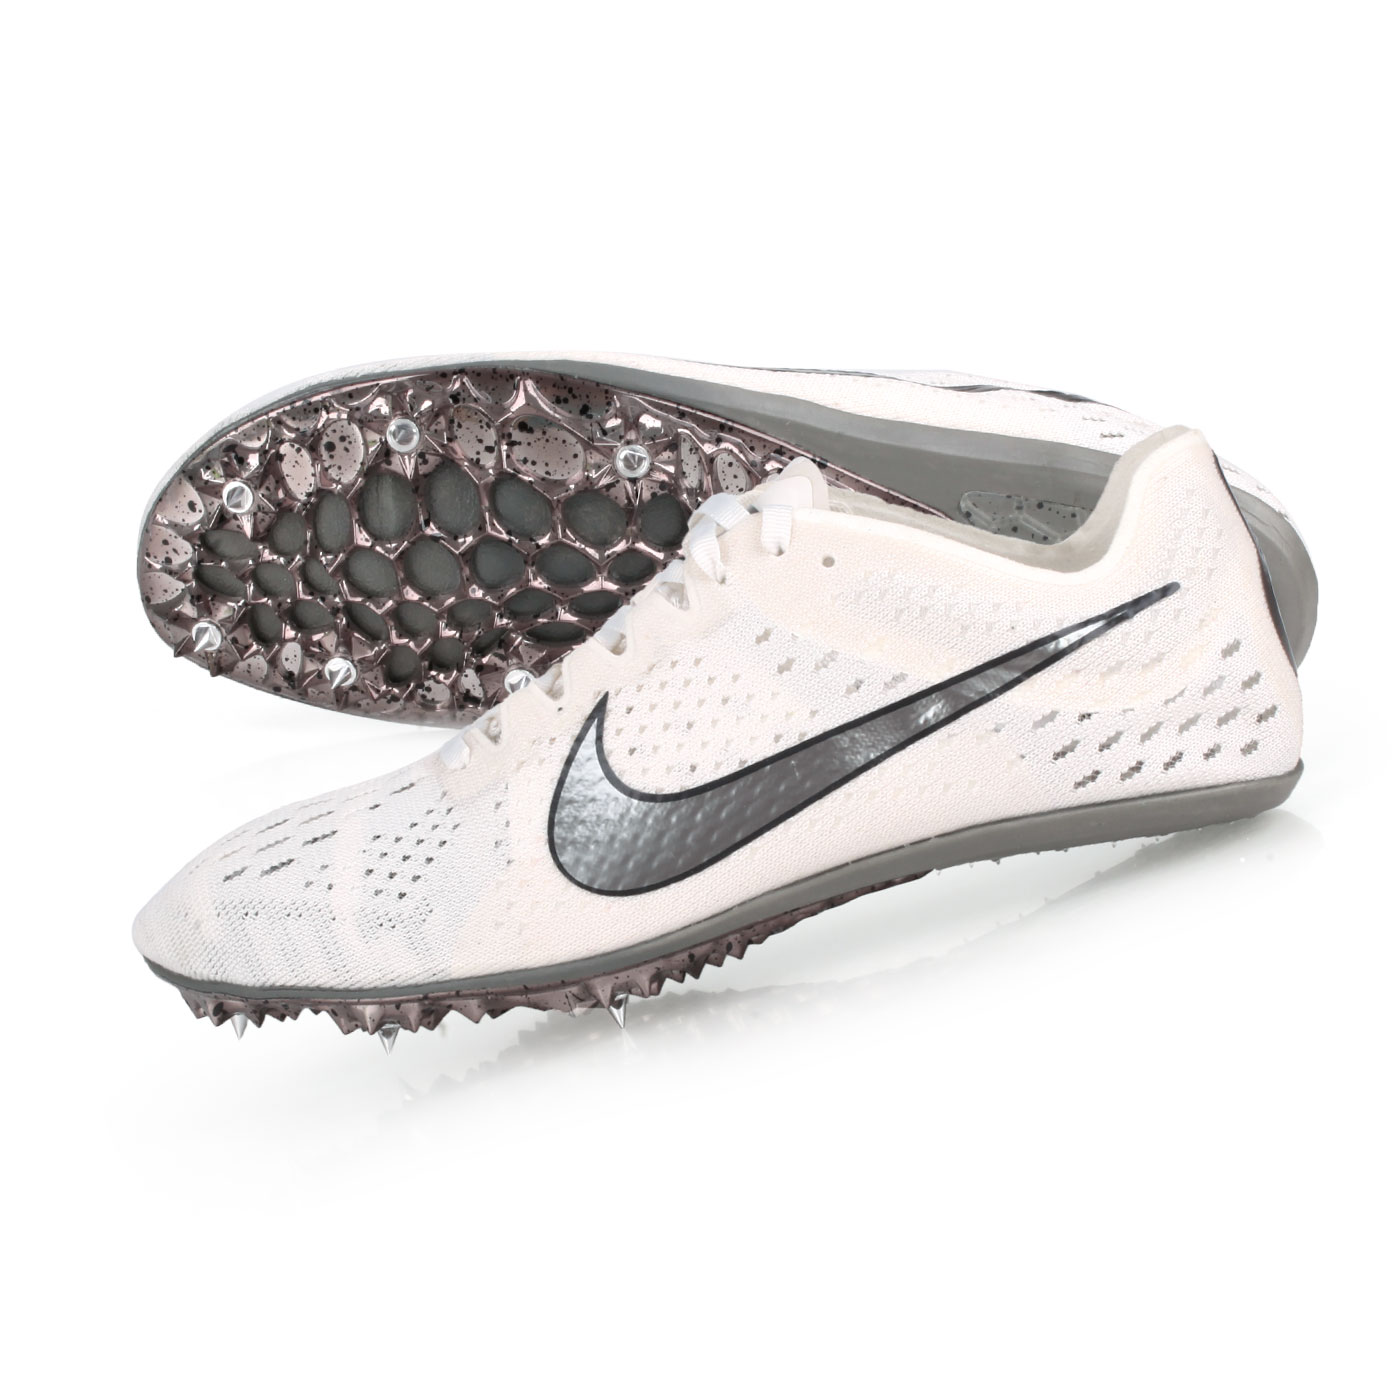 NIKE 田徑釘鞋(中長距離)  @ZOOM VICTORY ELITE 2@835998001 - 白黑銀